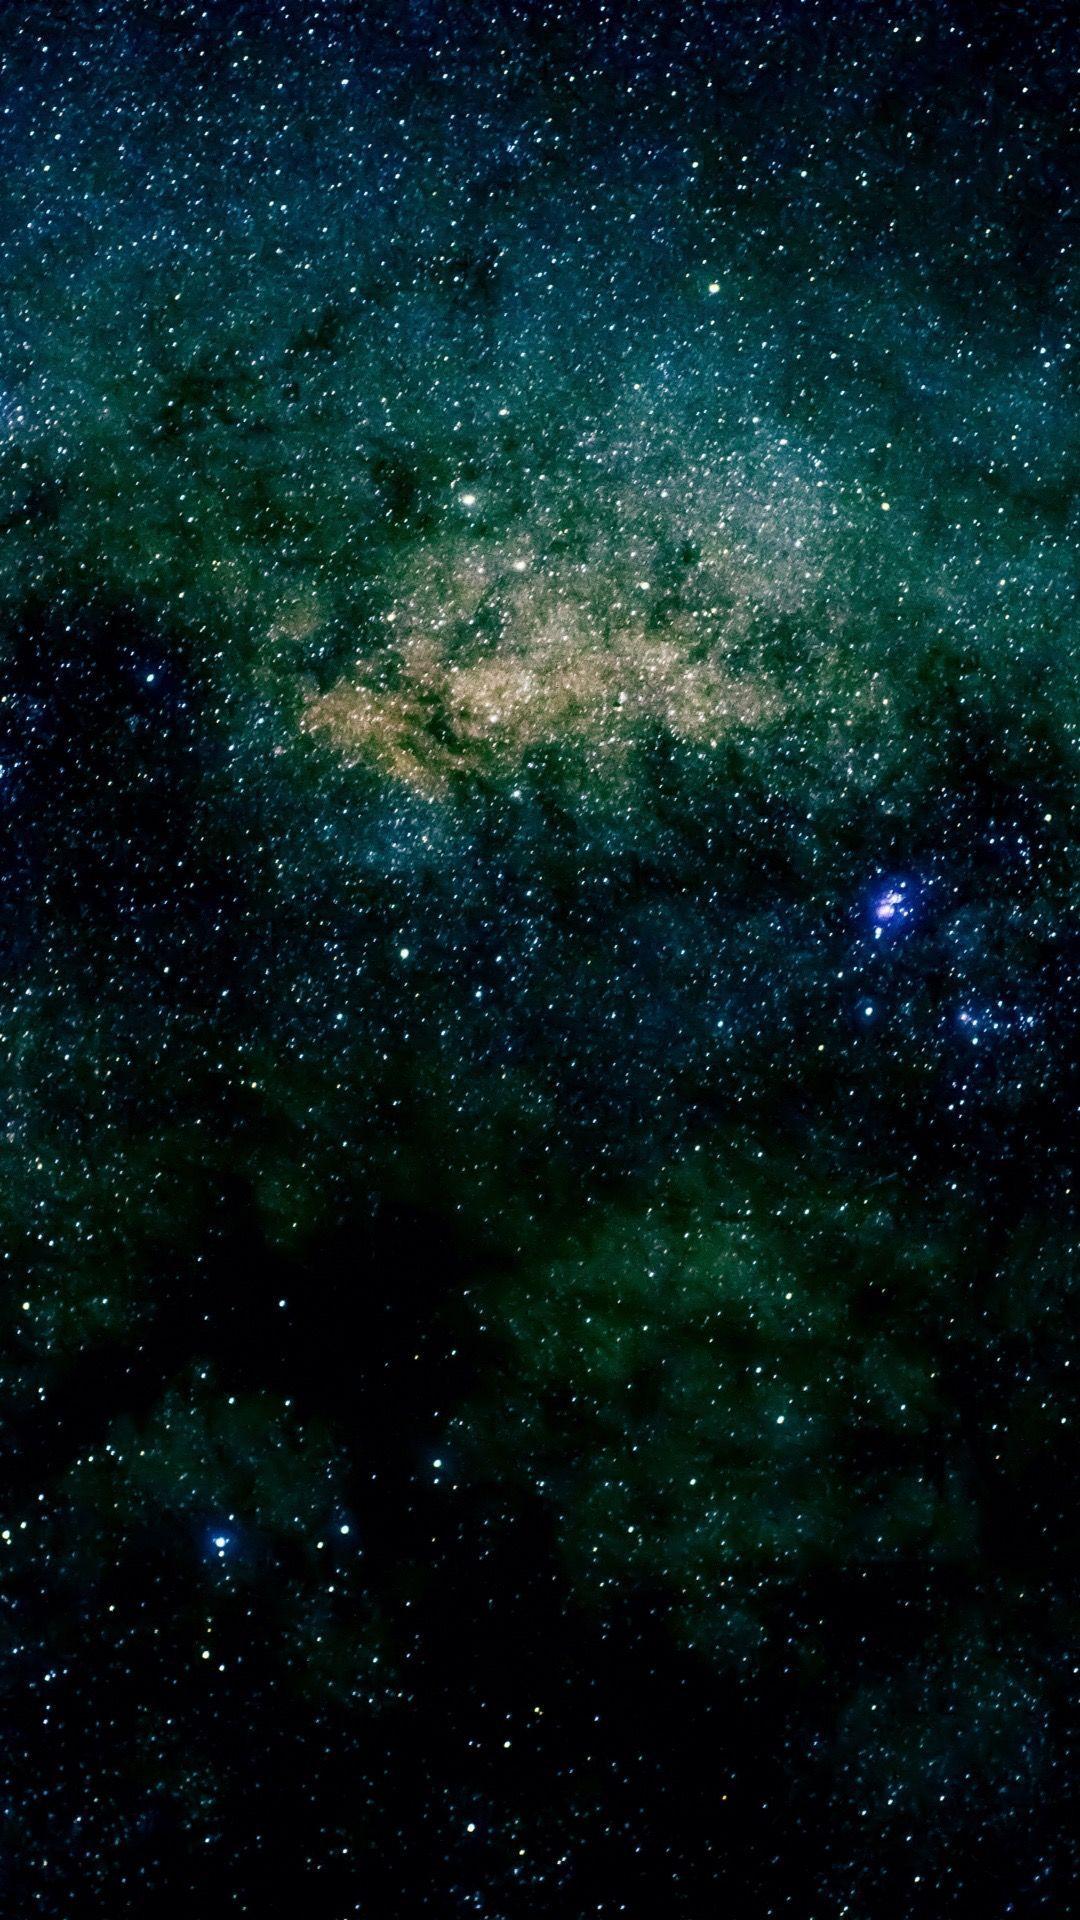 Green Sky Astronomical Object Blue Galaxy Nebula In 2020 Dark Green Wallpaper Aesthetic Desktop Wallpaper Galaxy Wallpaper